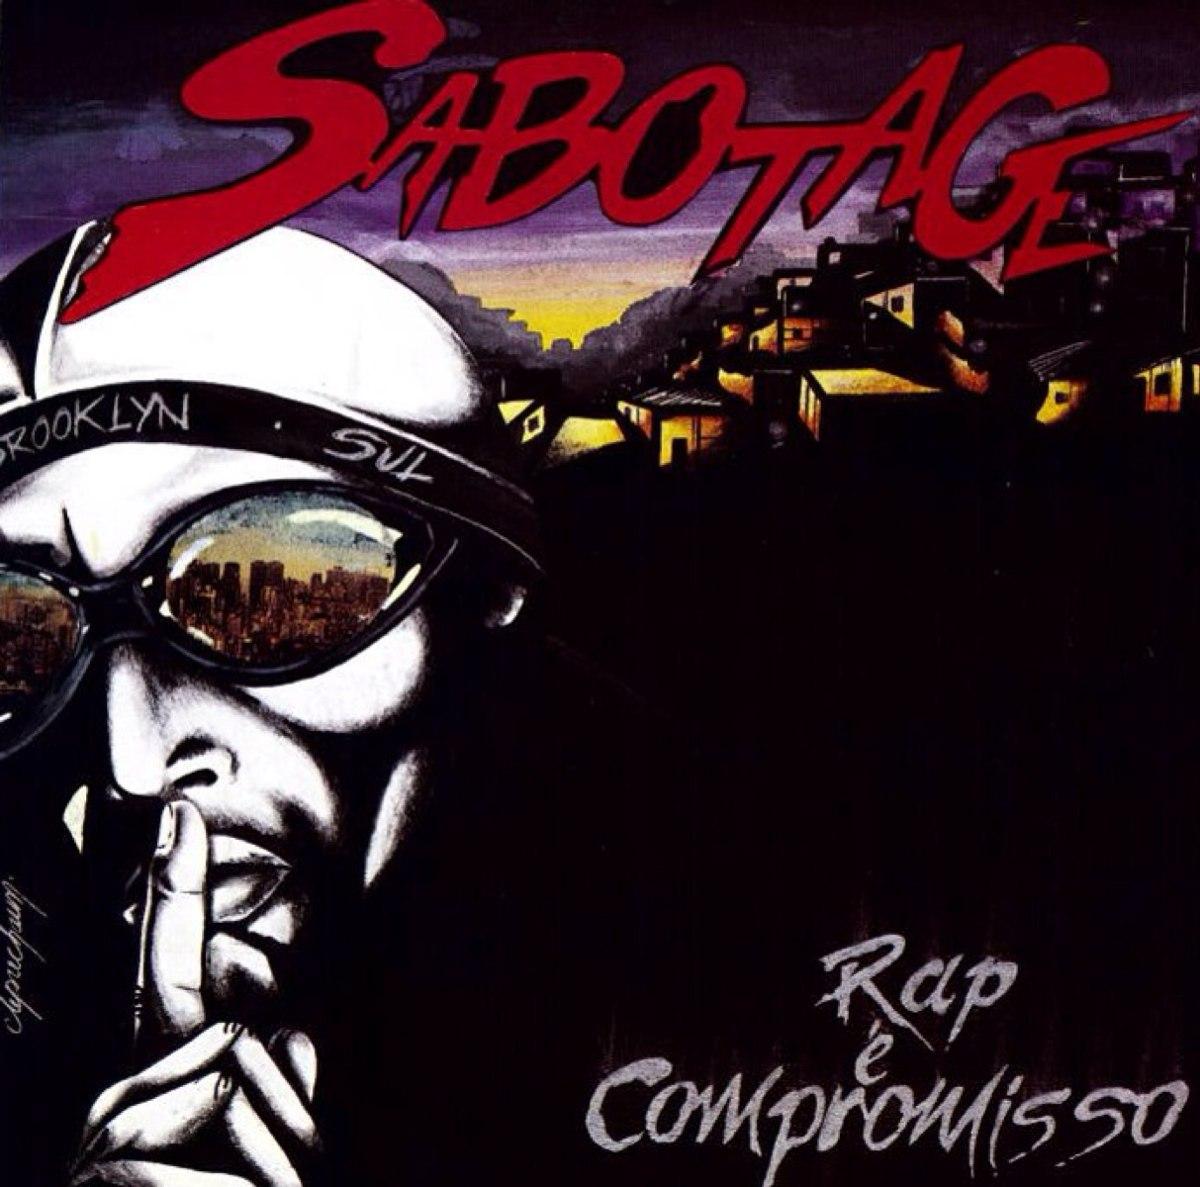 cd o rap compromisso